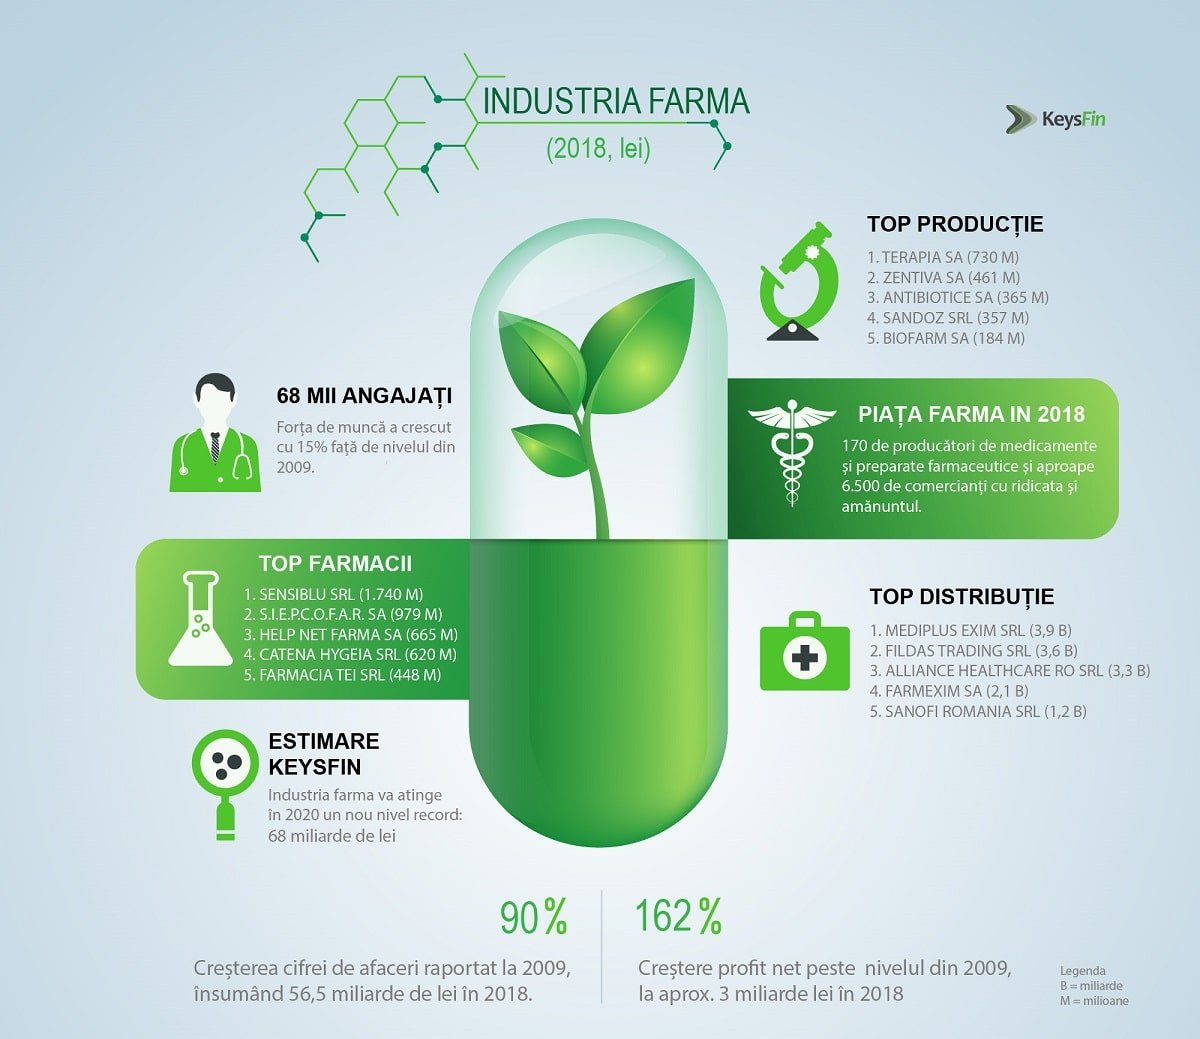 Industria farma Romania